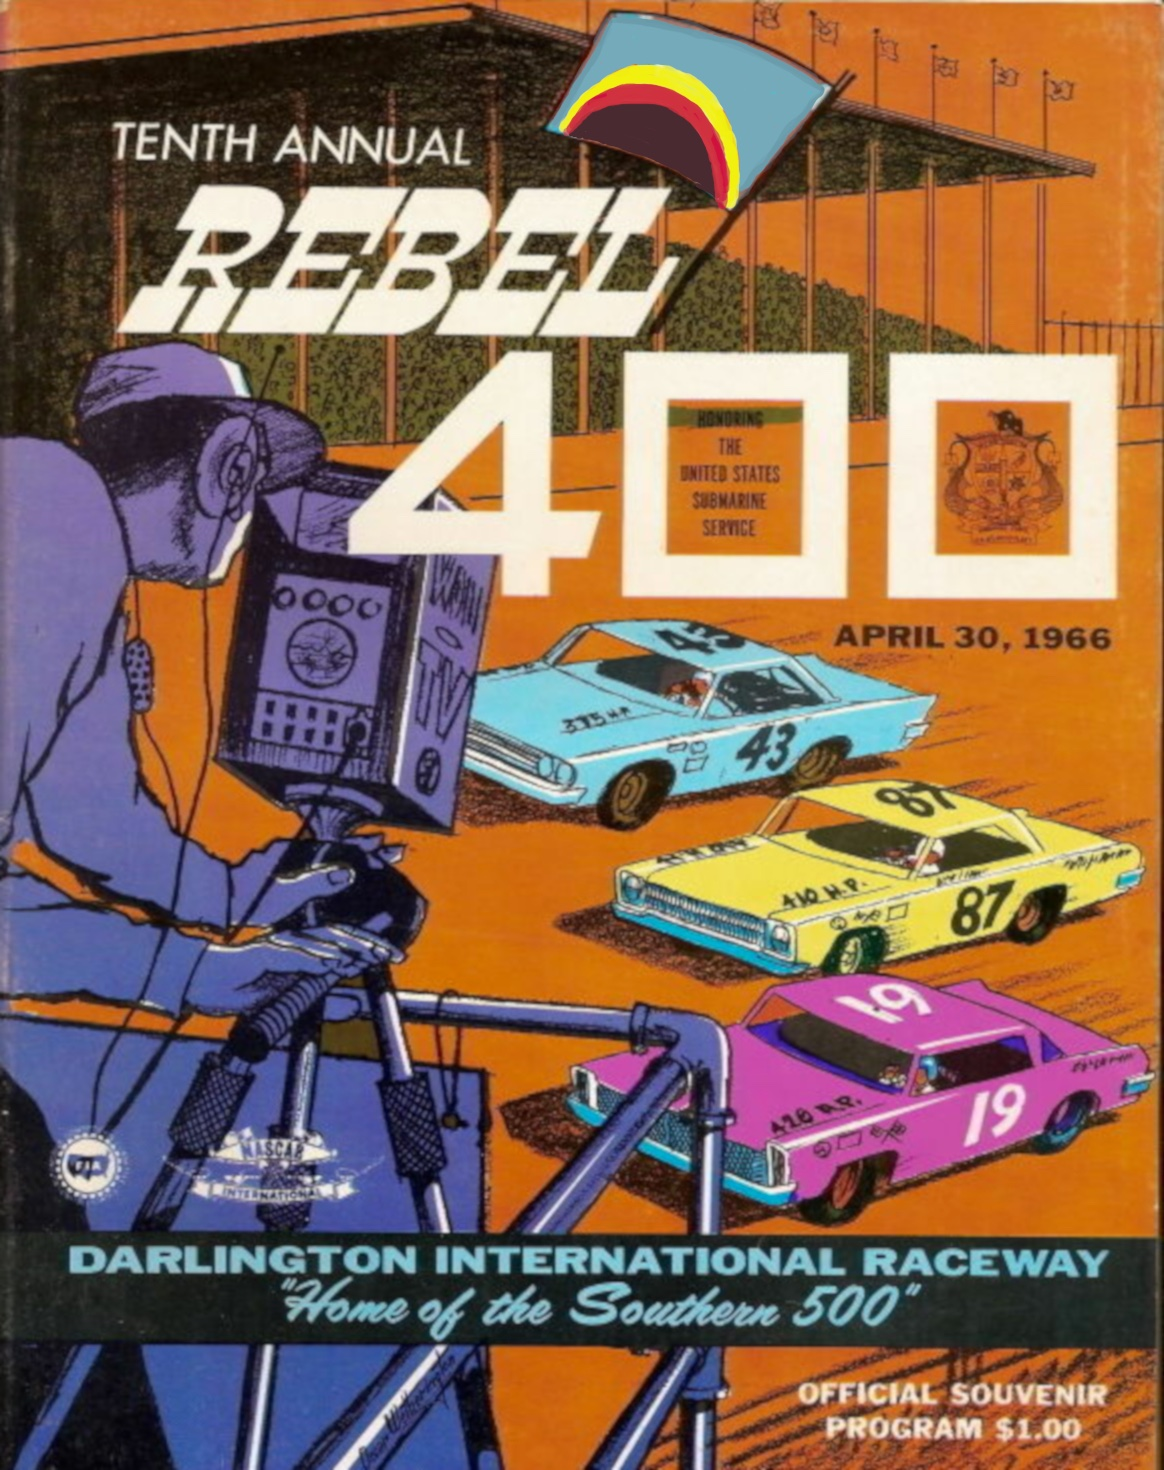 Darlington Speedway Poster, 1966